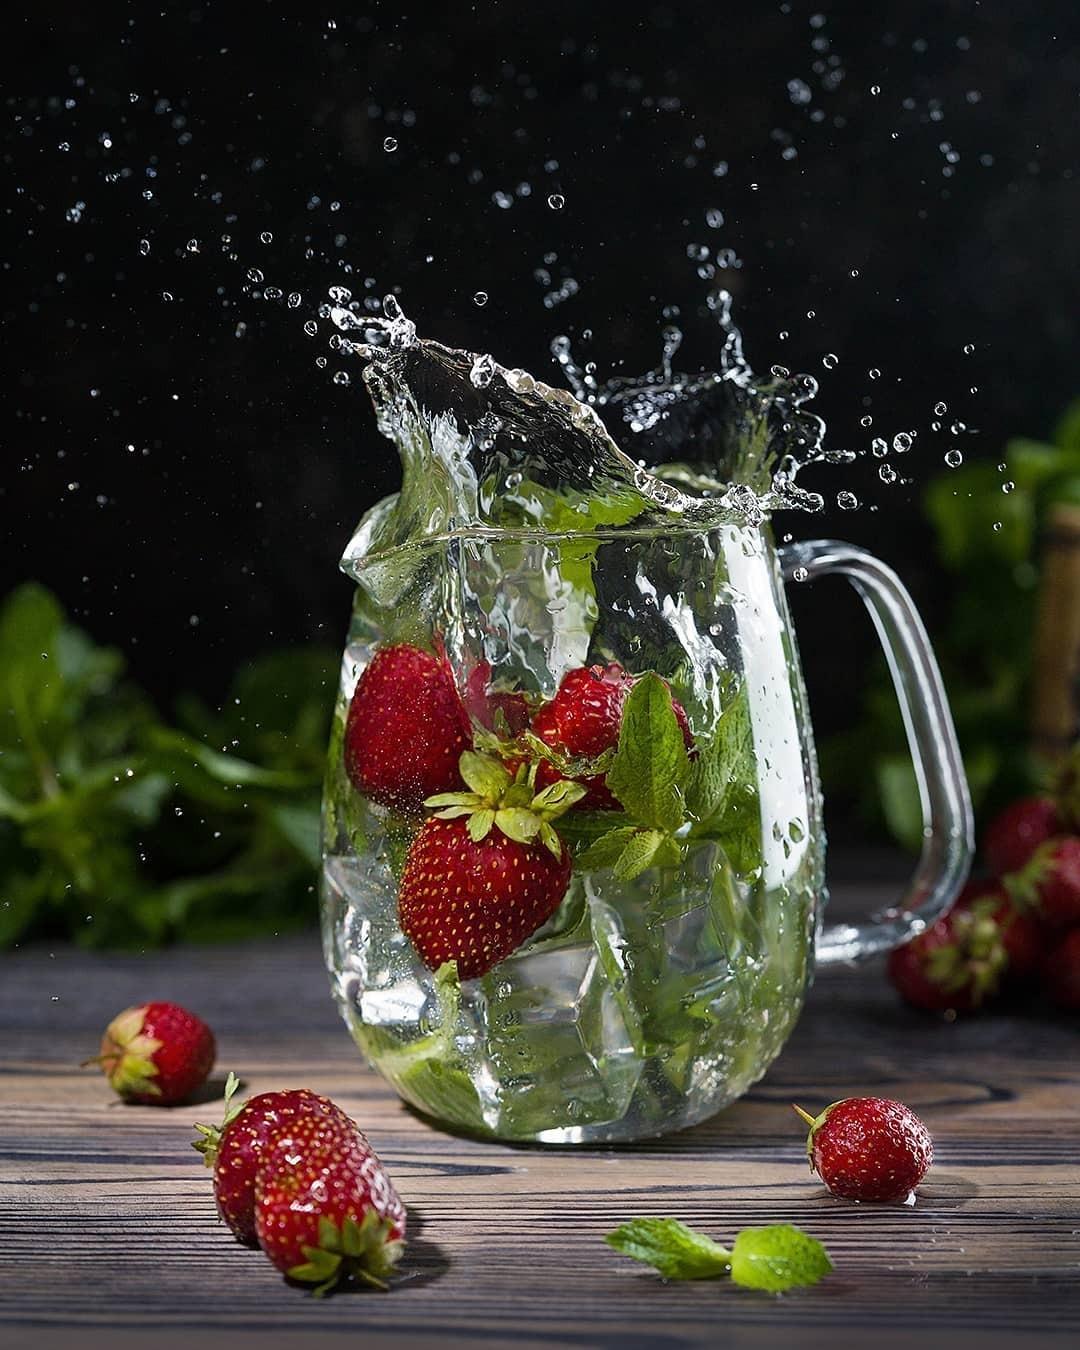 поздравим ягоды в воде фото обсудим